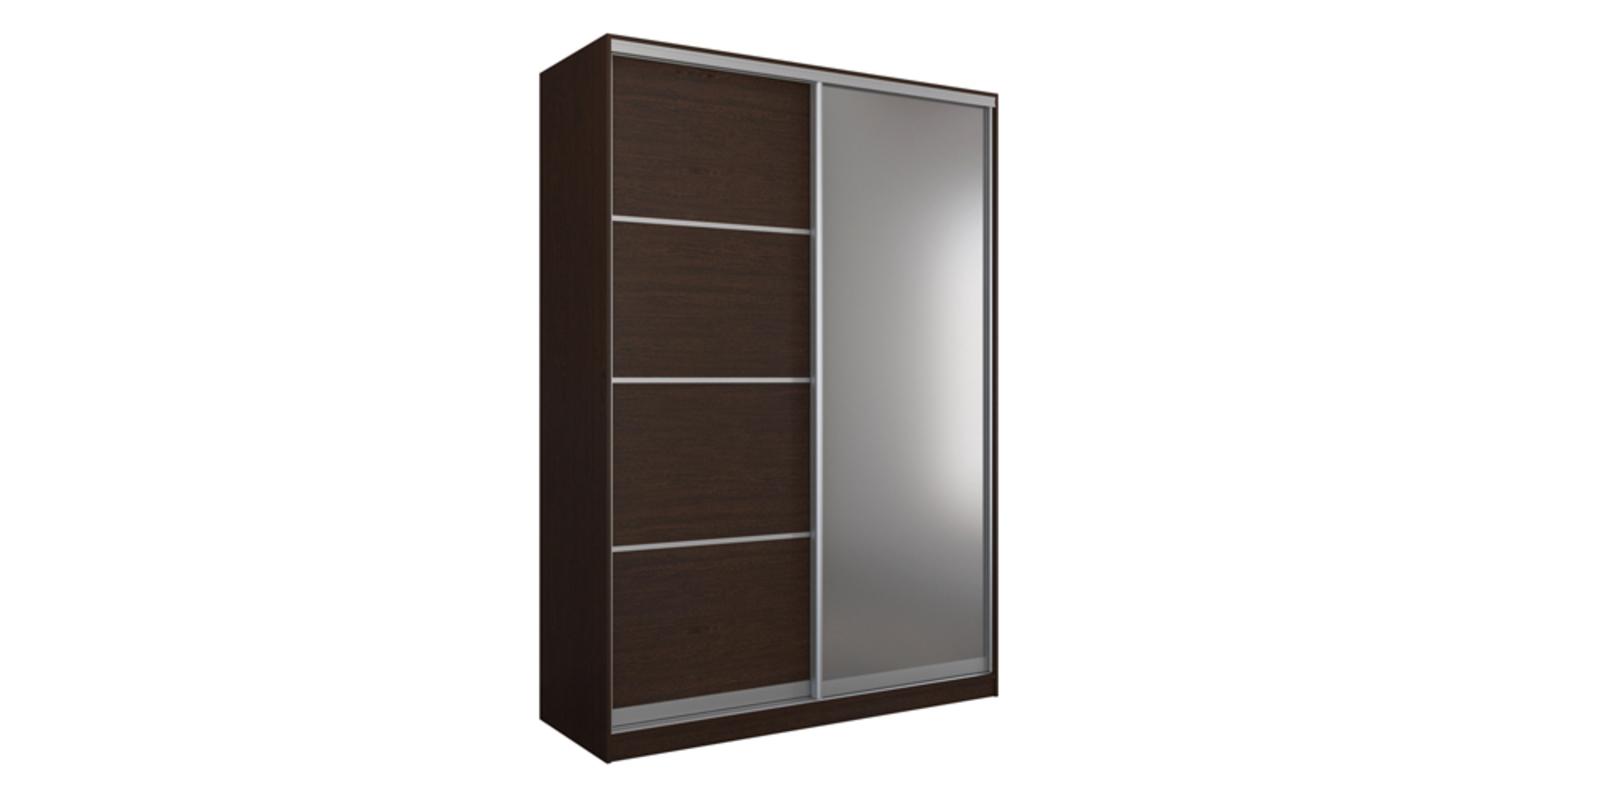 Шкаф-купе двухдверный Манхеттен 180 см (венге+зеркало)